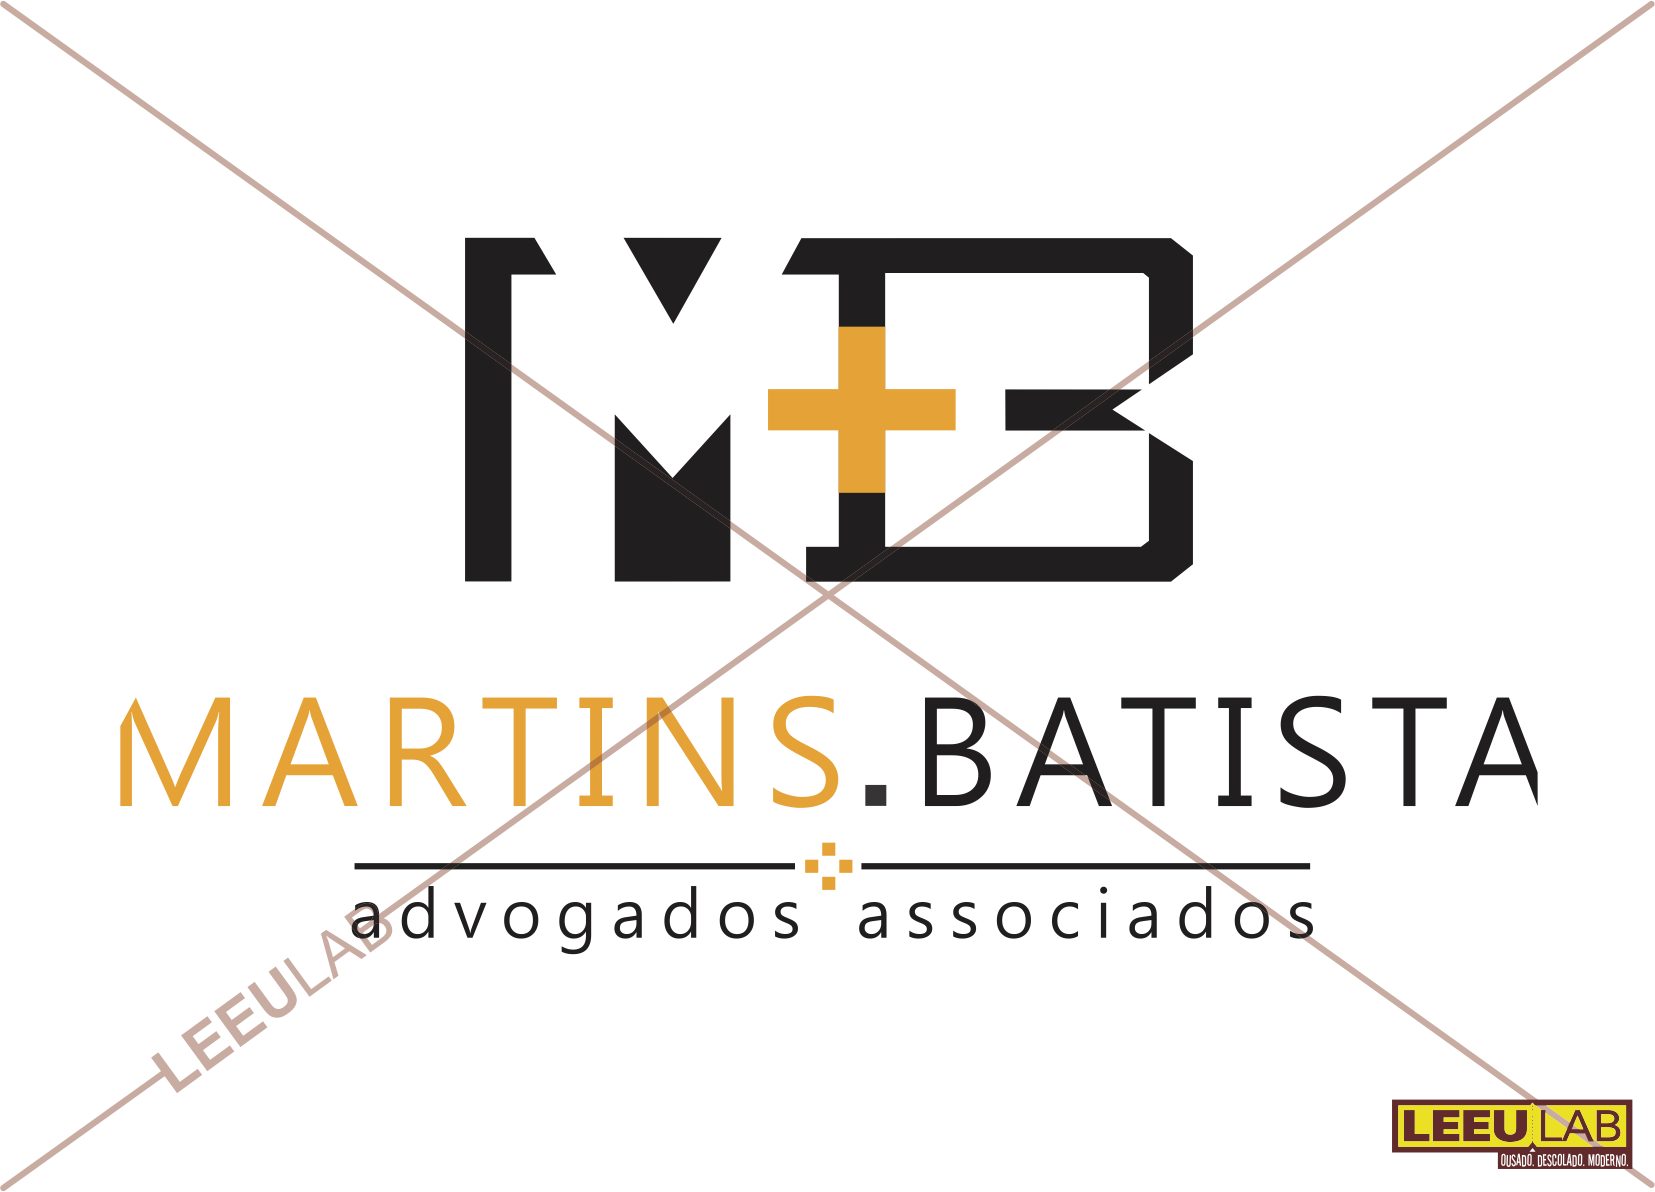 martins_batista_advogados_associados